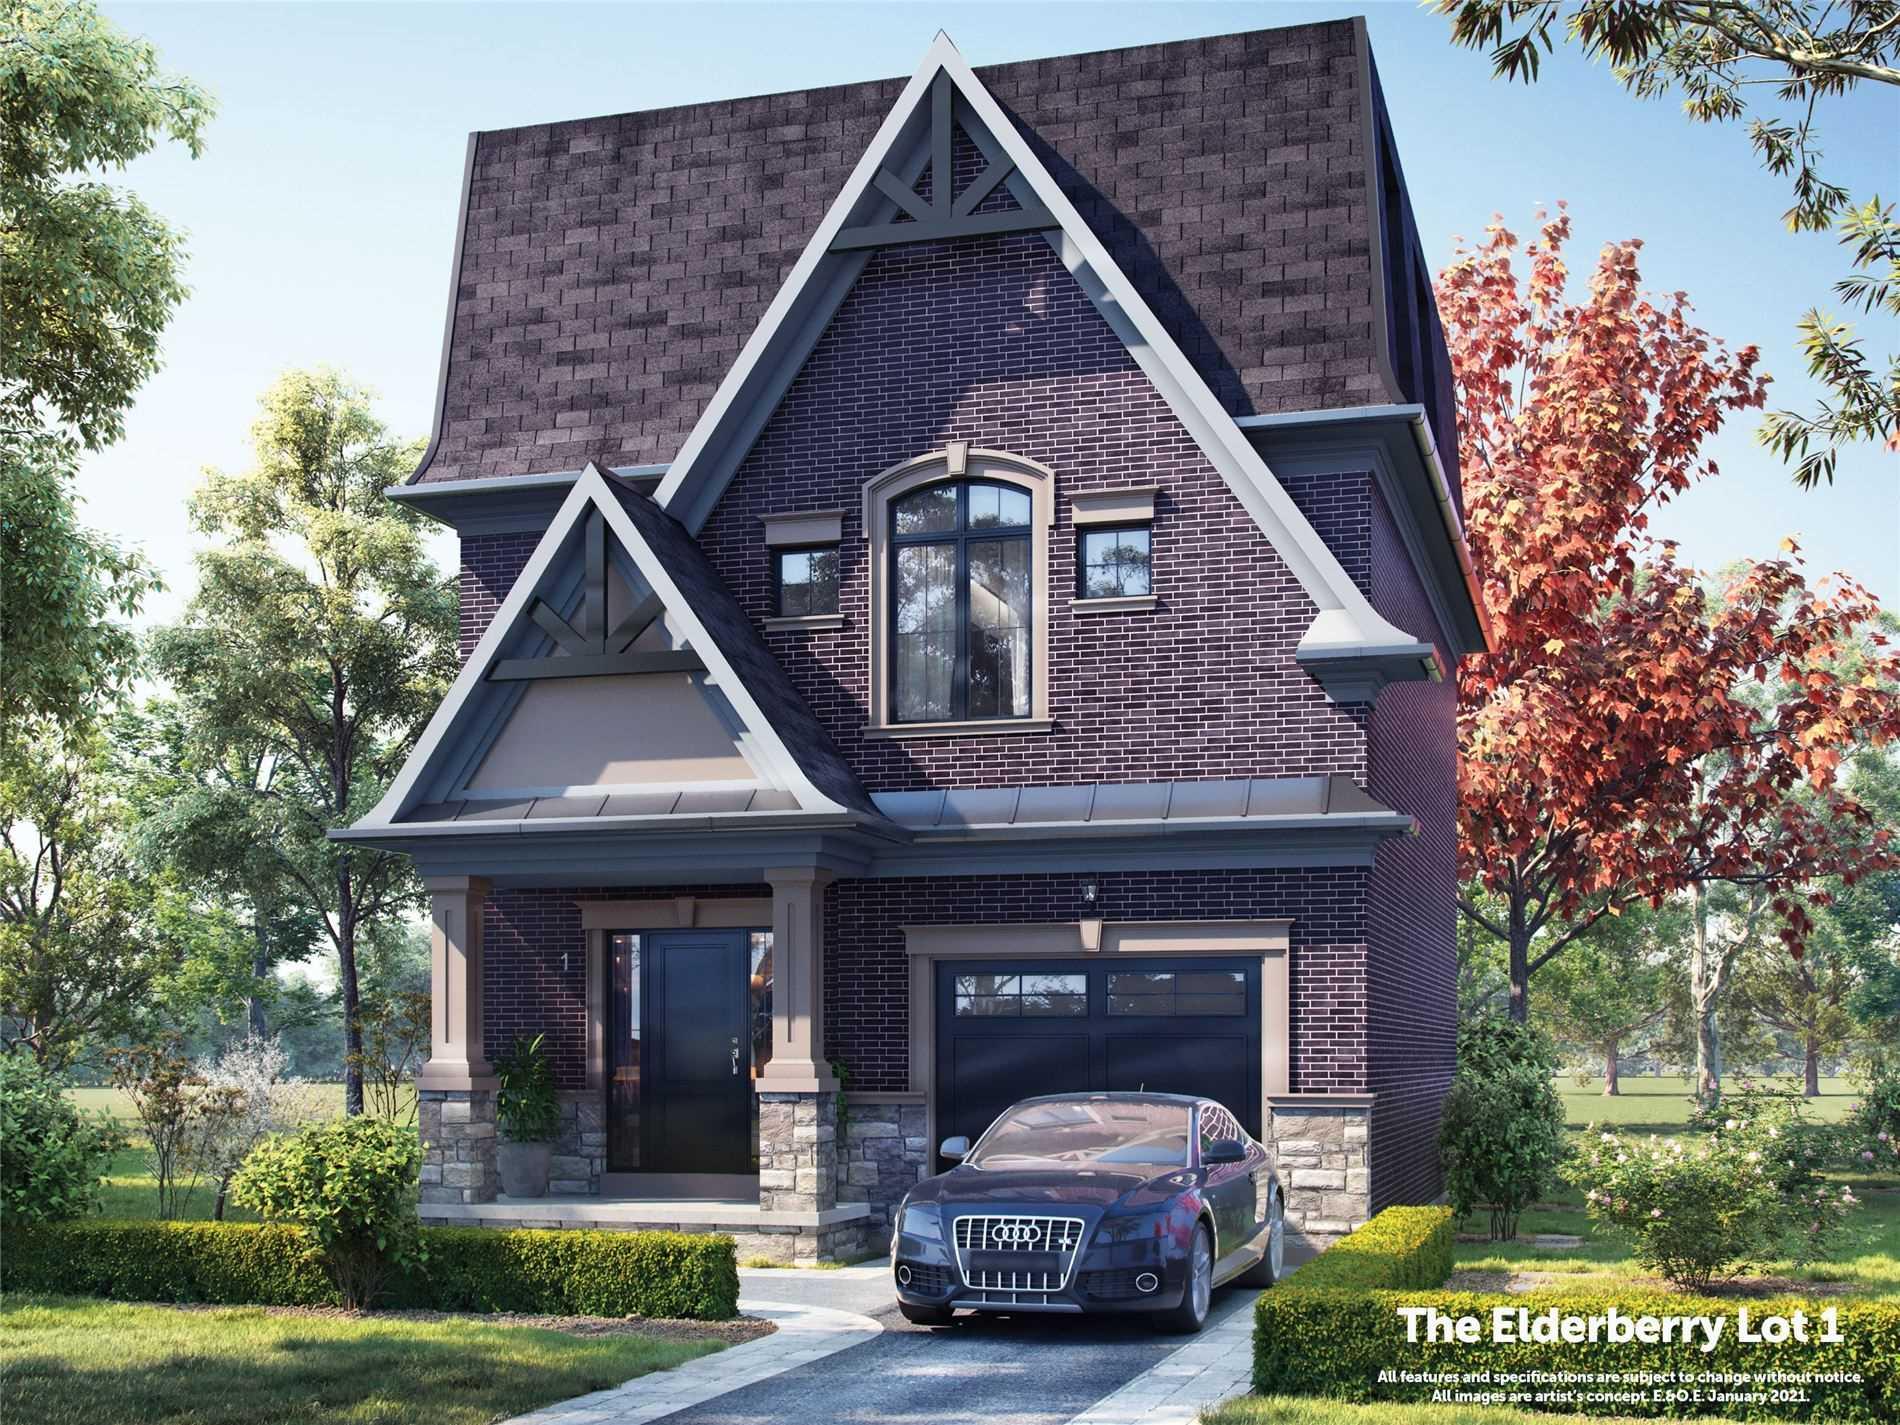 2996 Weston Rd, Toronto, Ontario M9M2S7, 4 Bedrooms Bedrooms, 8 Rooms Rooms,5 BathroomsBathrooms,Detached,For Sale,Weston,W5371682